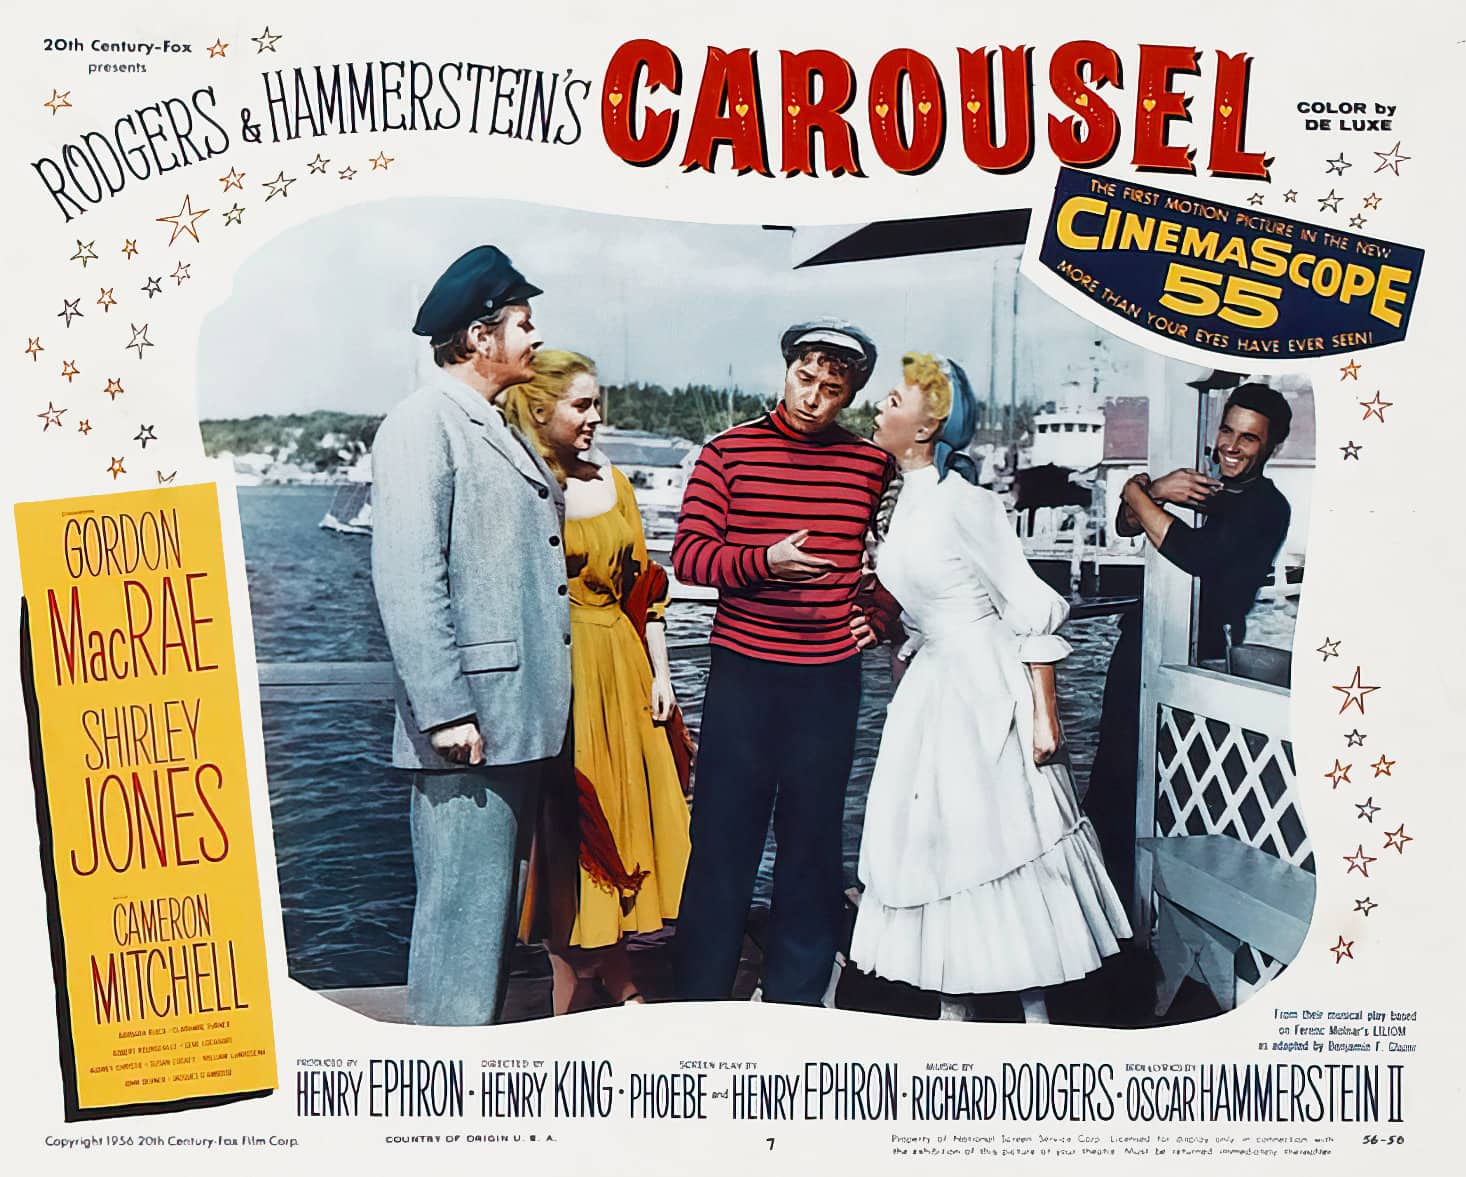 Vintage Carousel movie lobby card - 1950s (3)